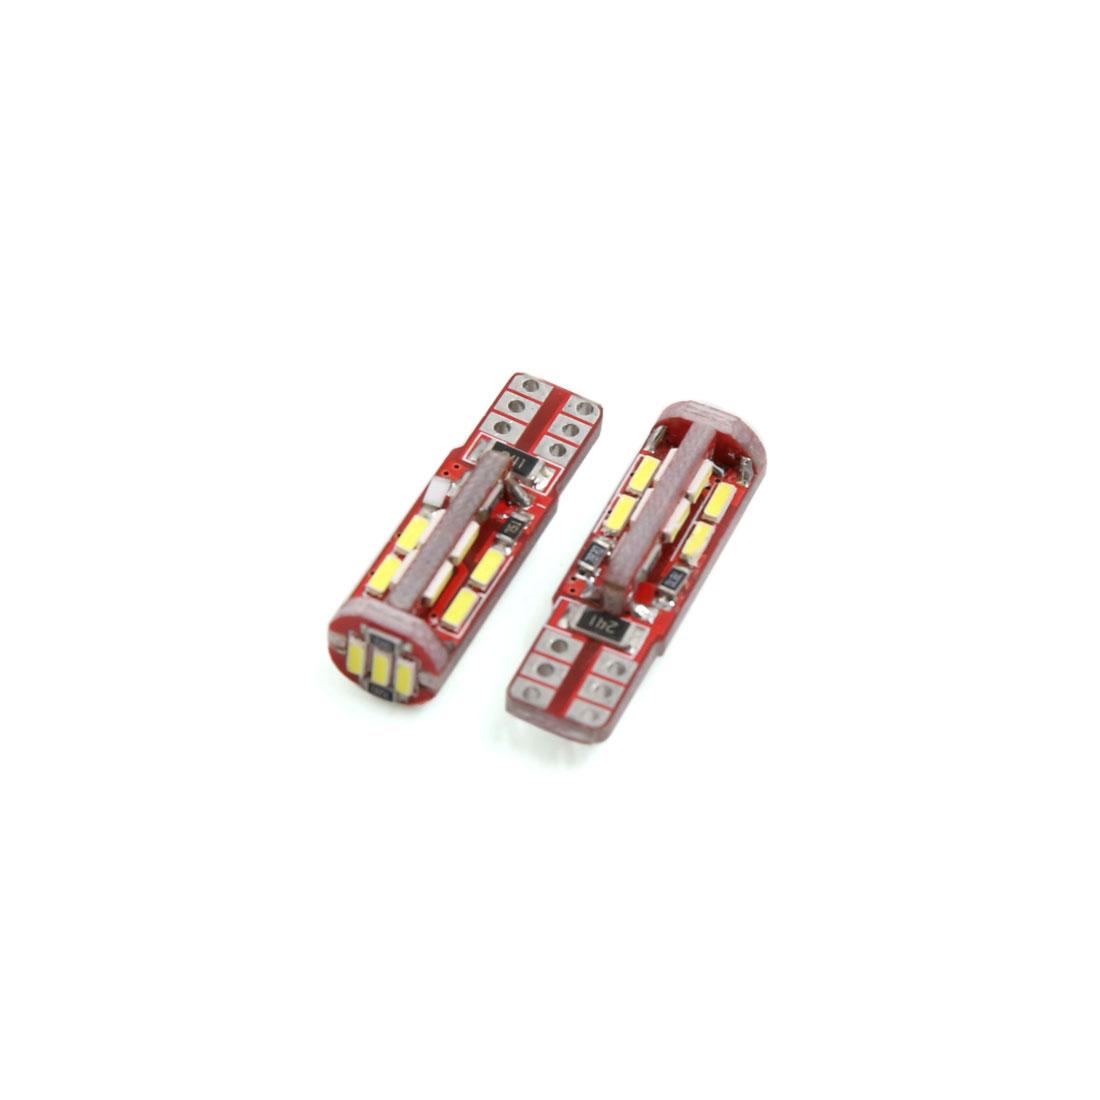 2Pcs T10 White 19 4010-SMD LED Car Panel Light Interior W5W 2825 158 192 194